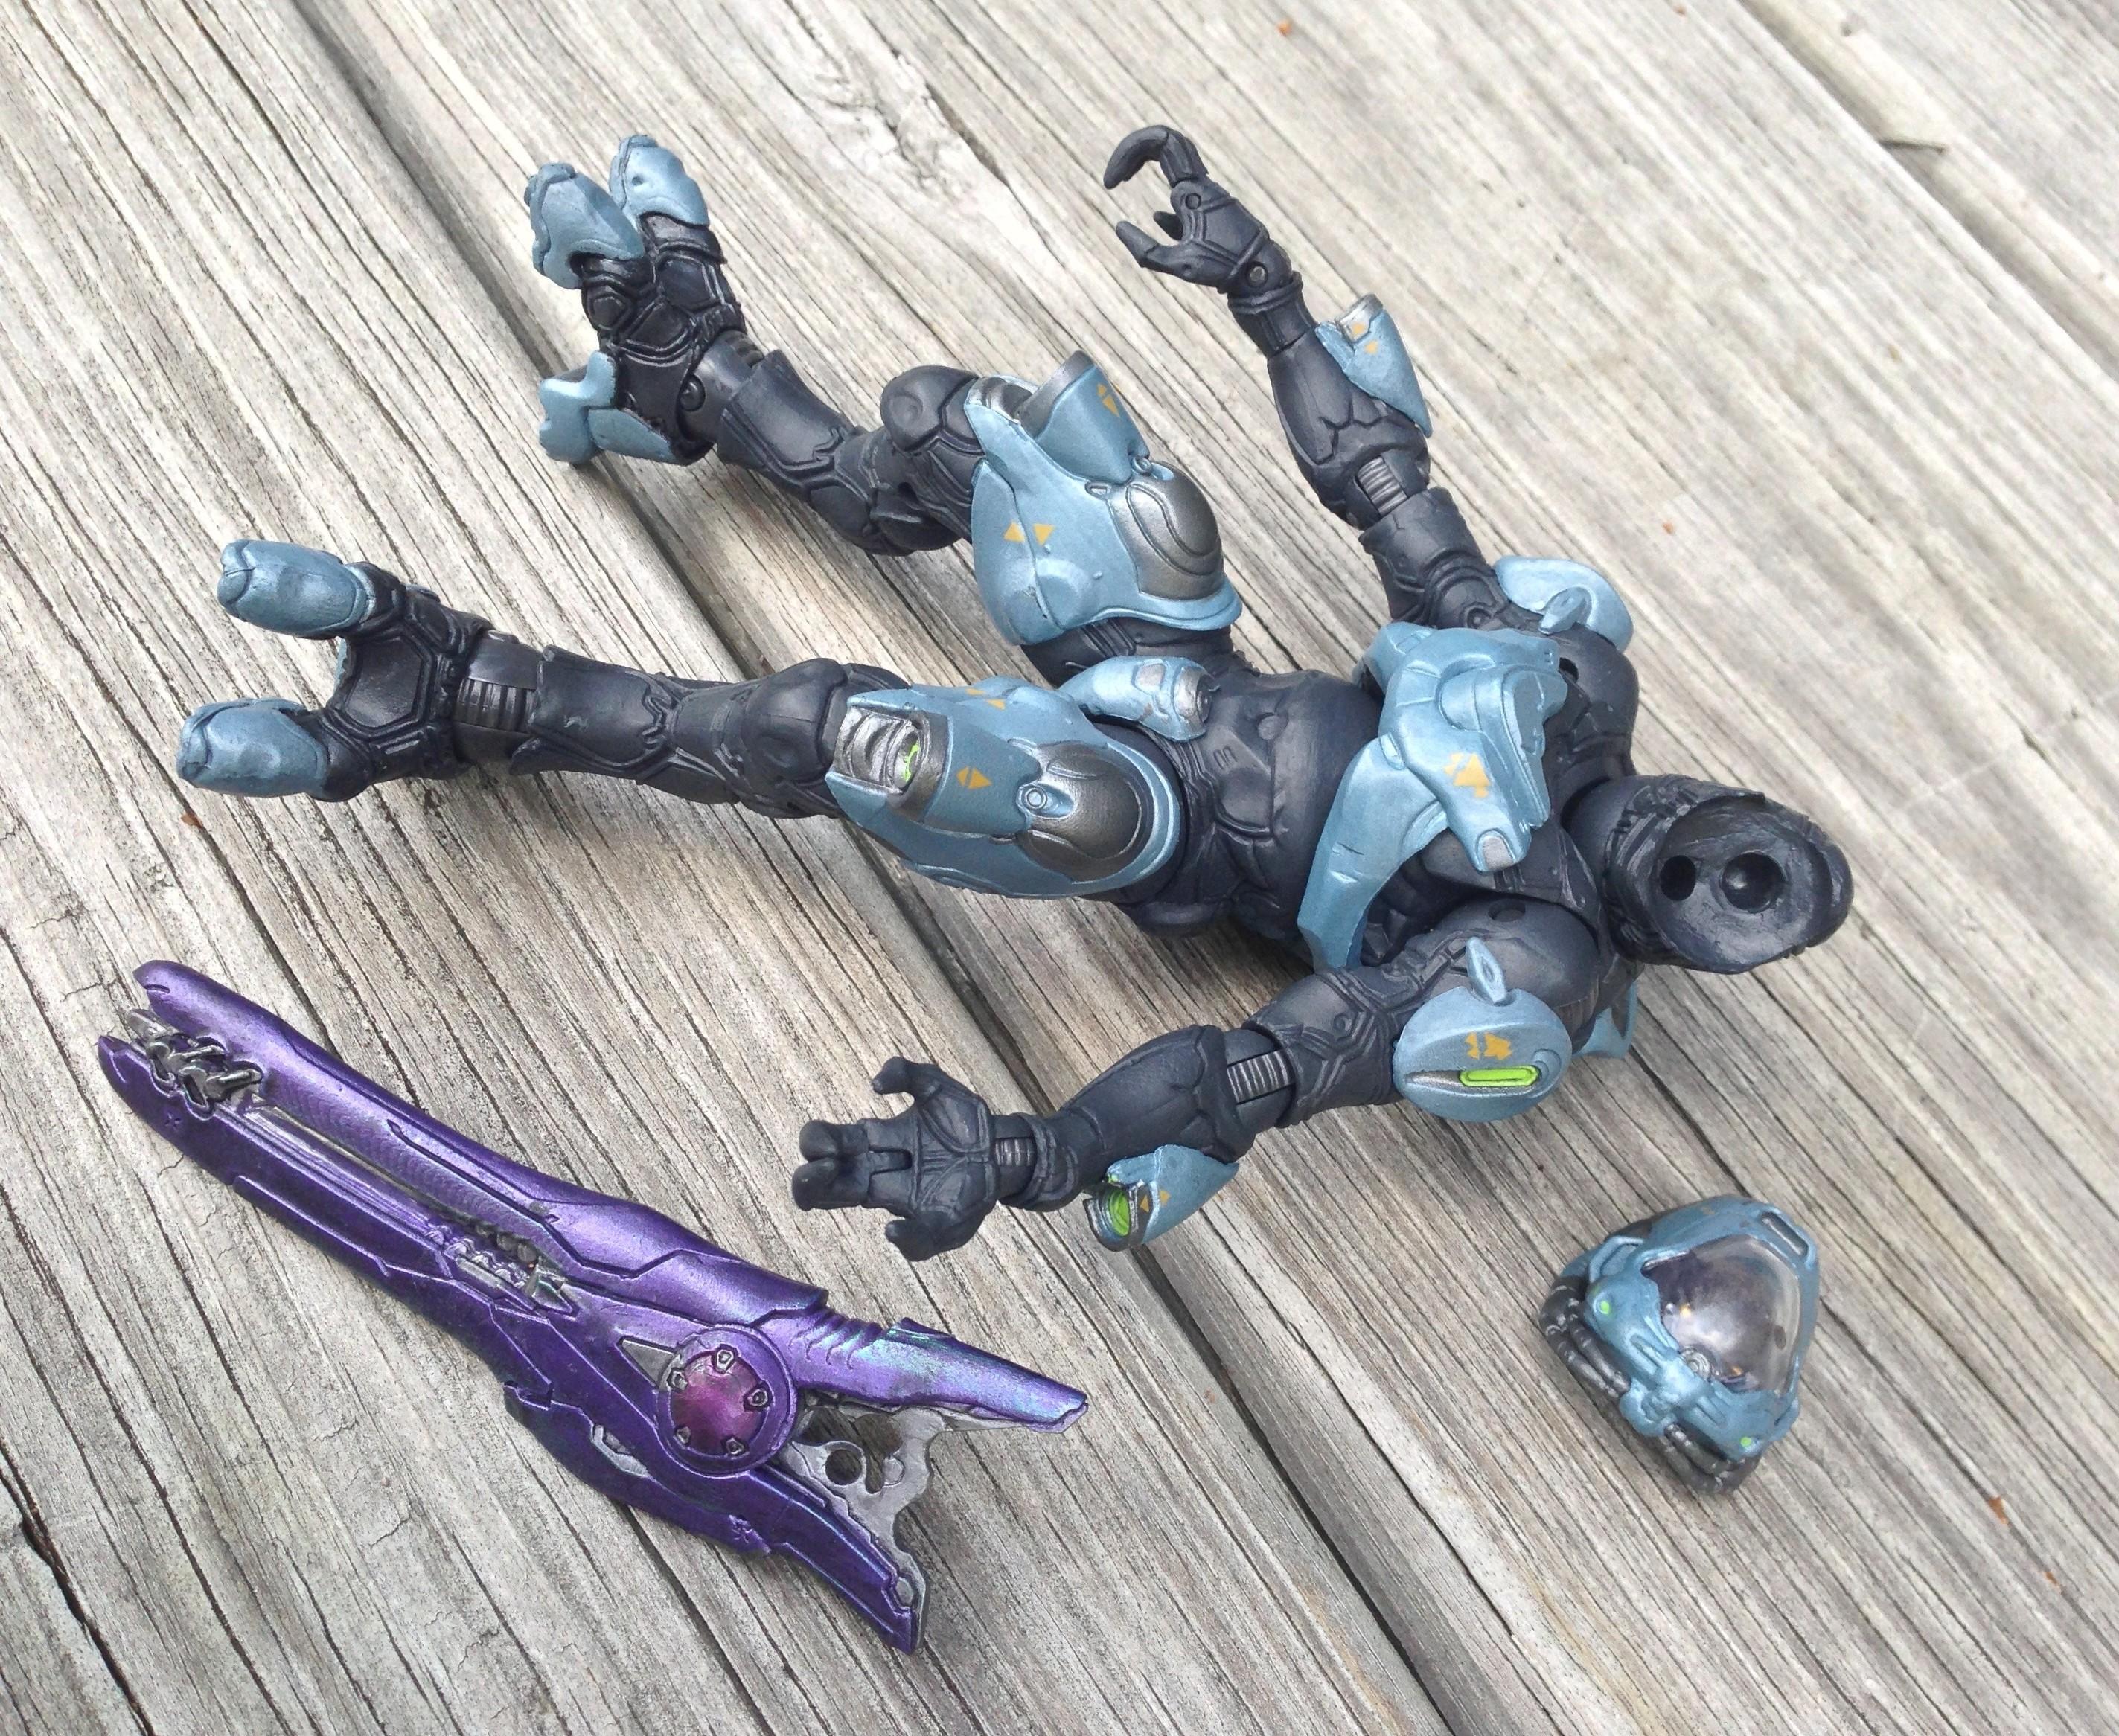 Halo 4 Series 2 Elite Ranger Figure Review (McFarlane Toys